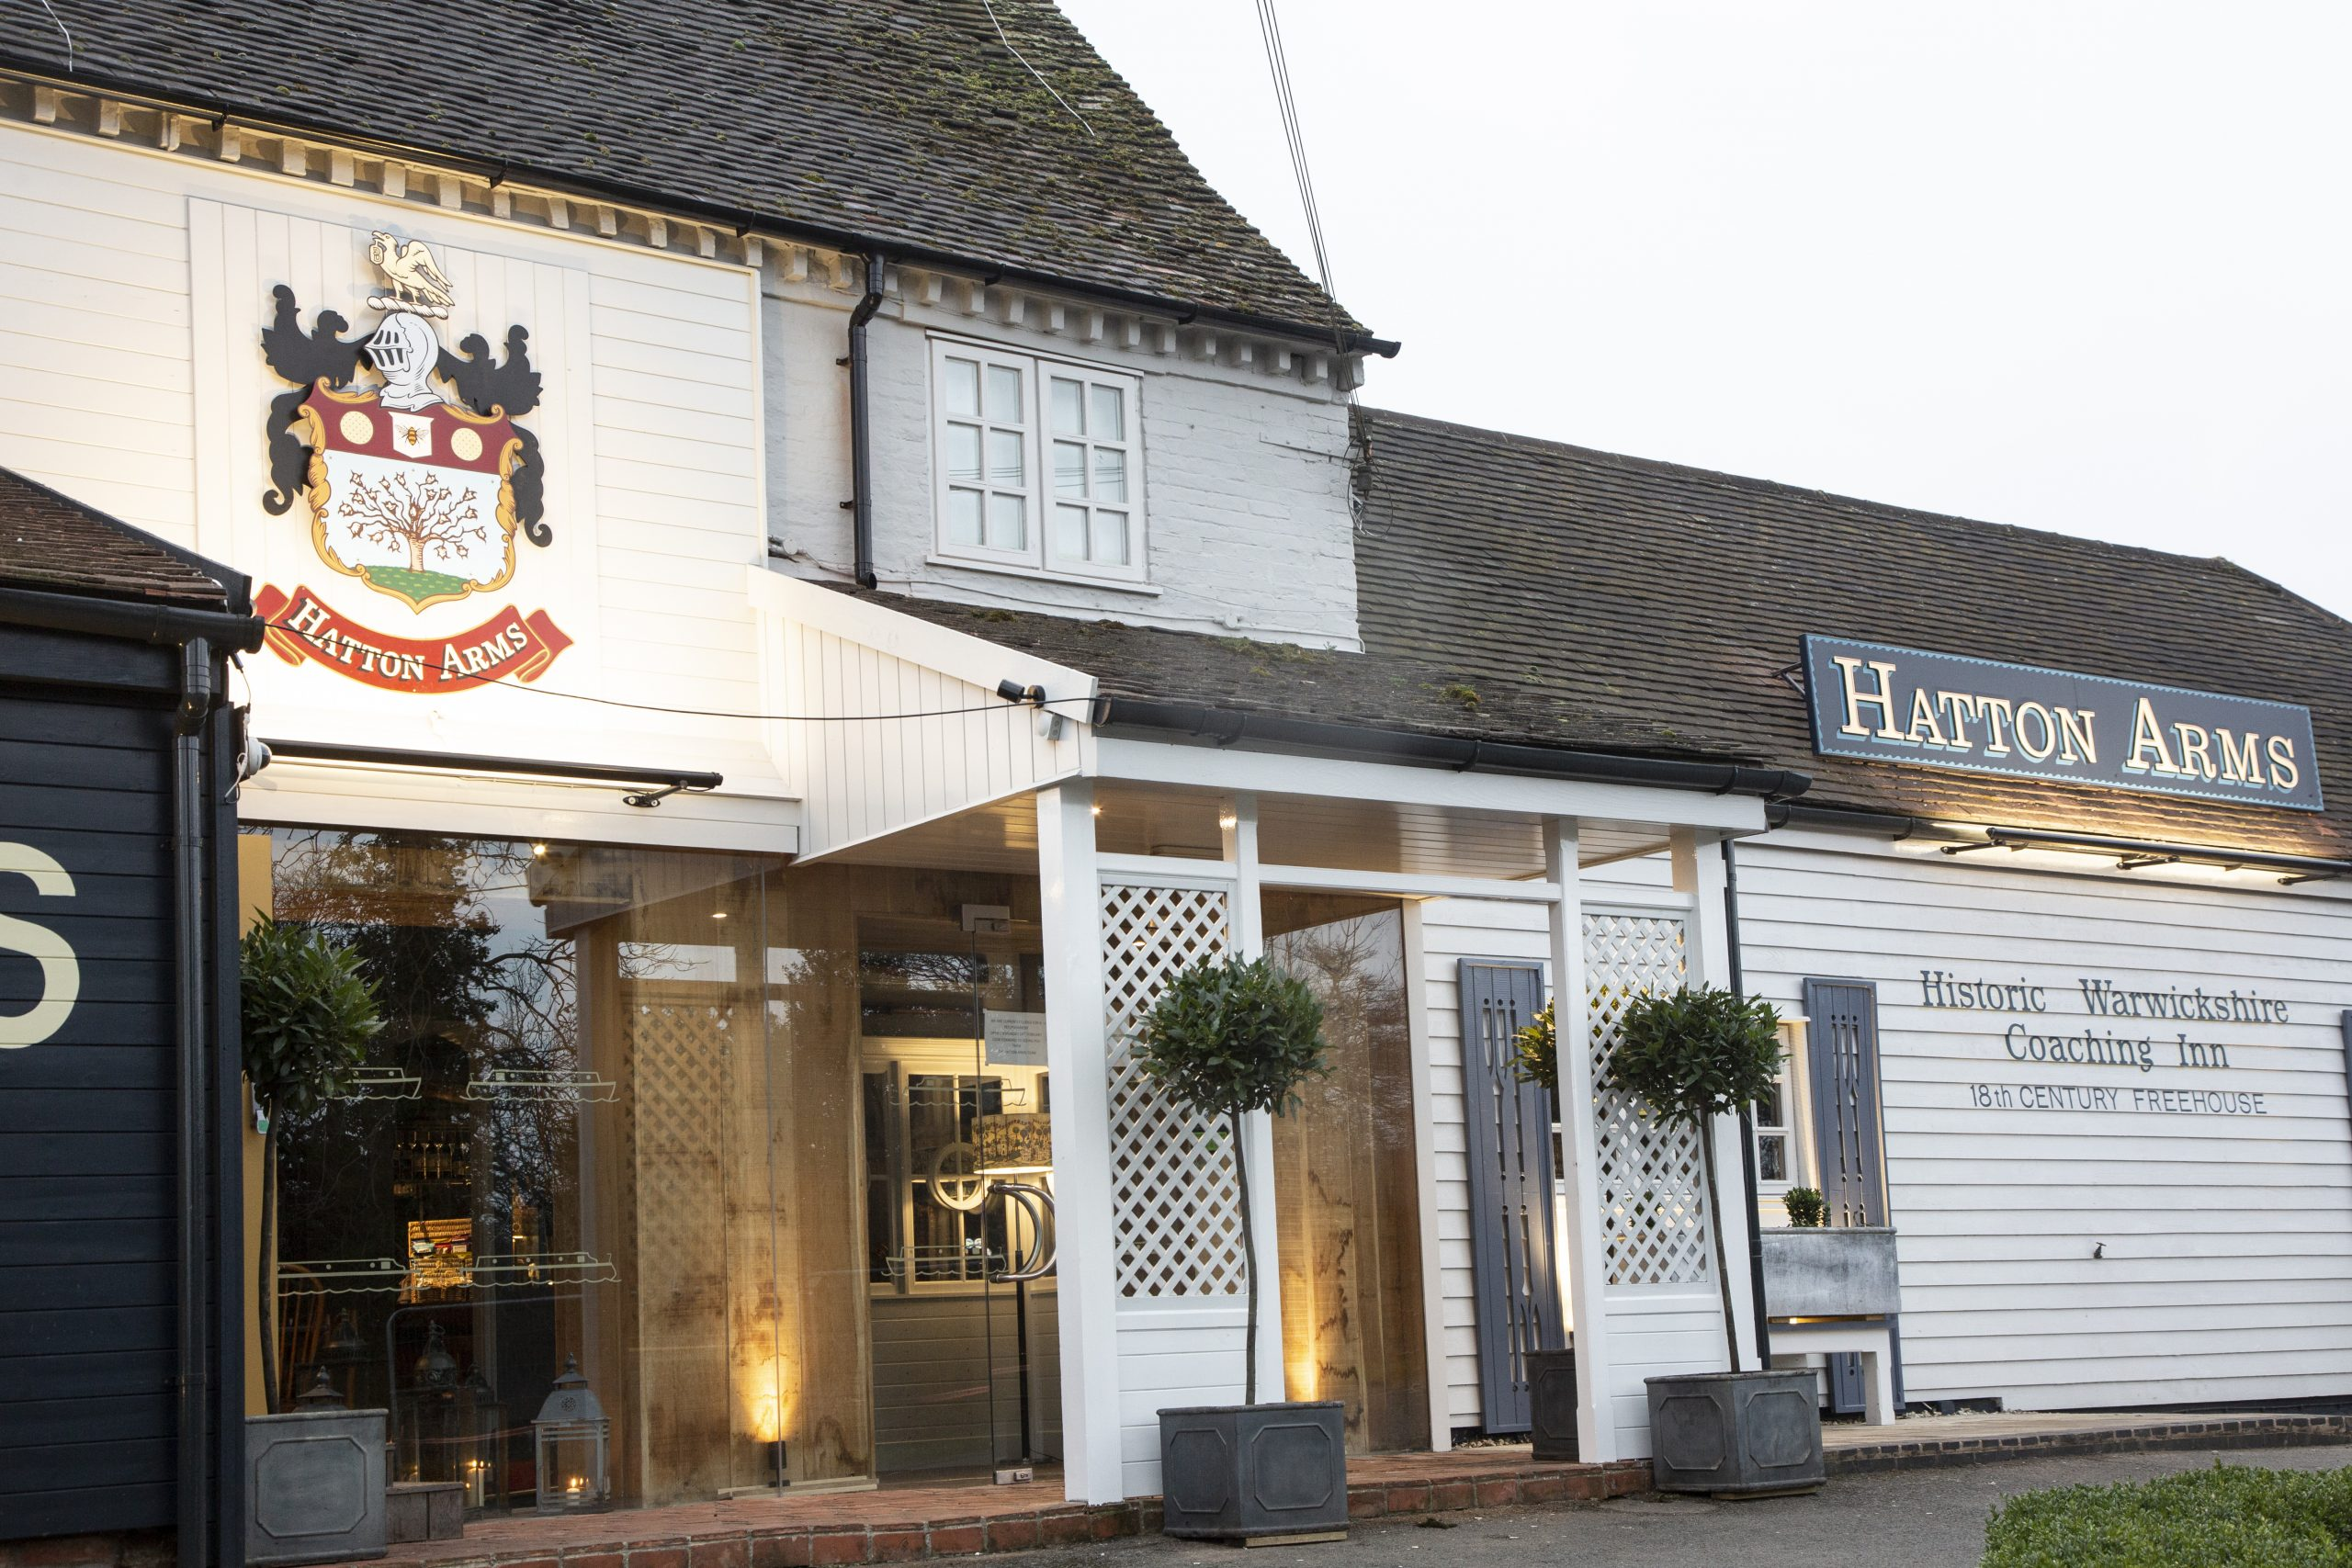 The Hatton Arms, Christmas Menu, Warwick